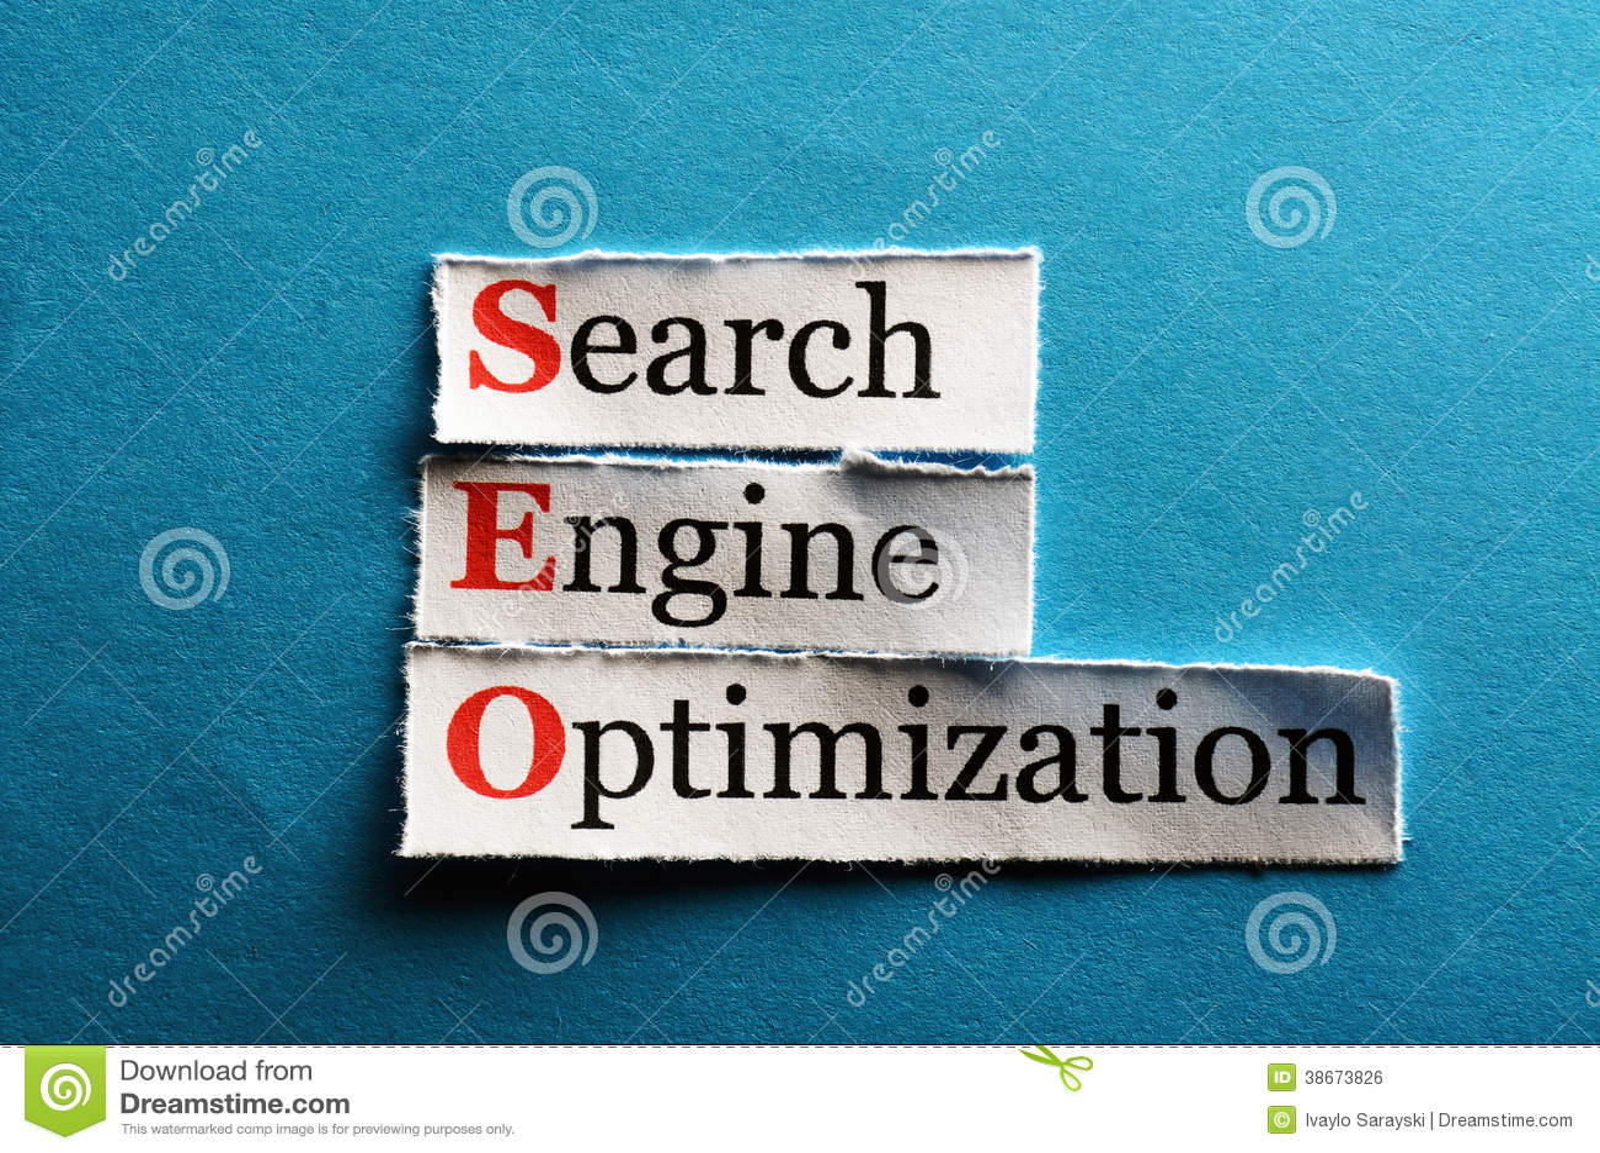 Seo Abbreviation Royalty Free Stock Image